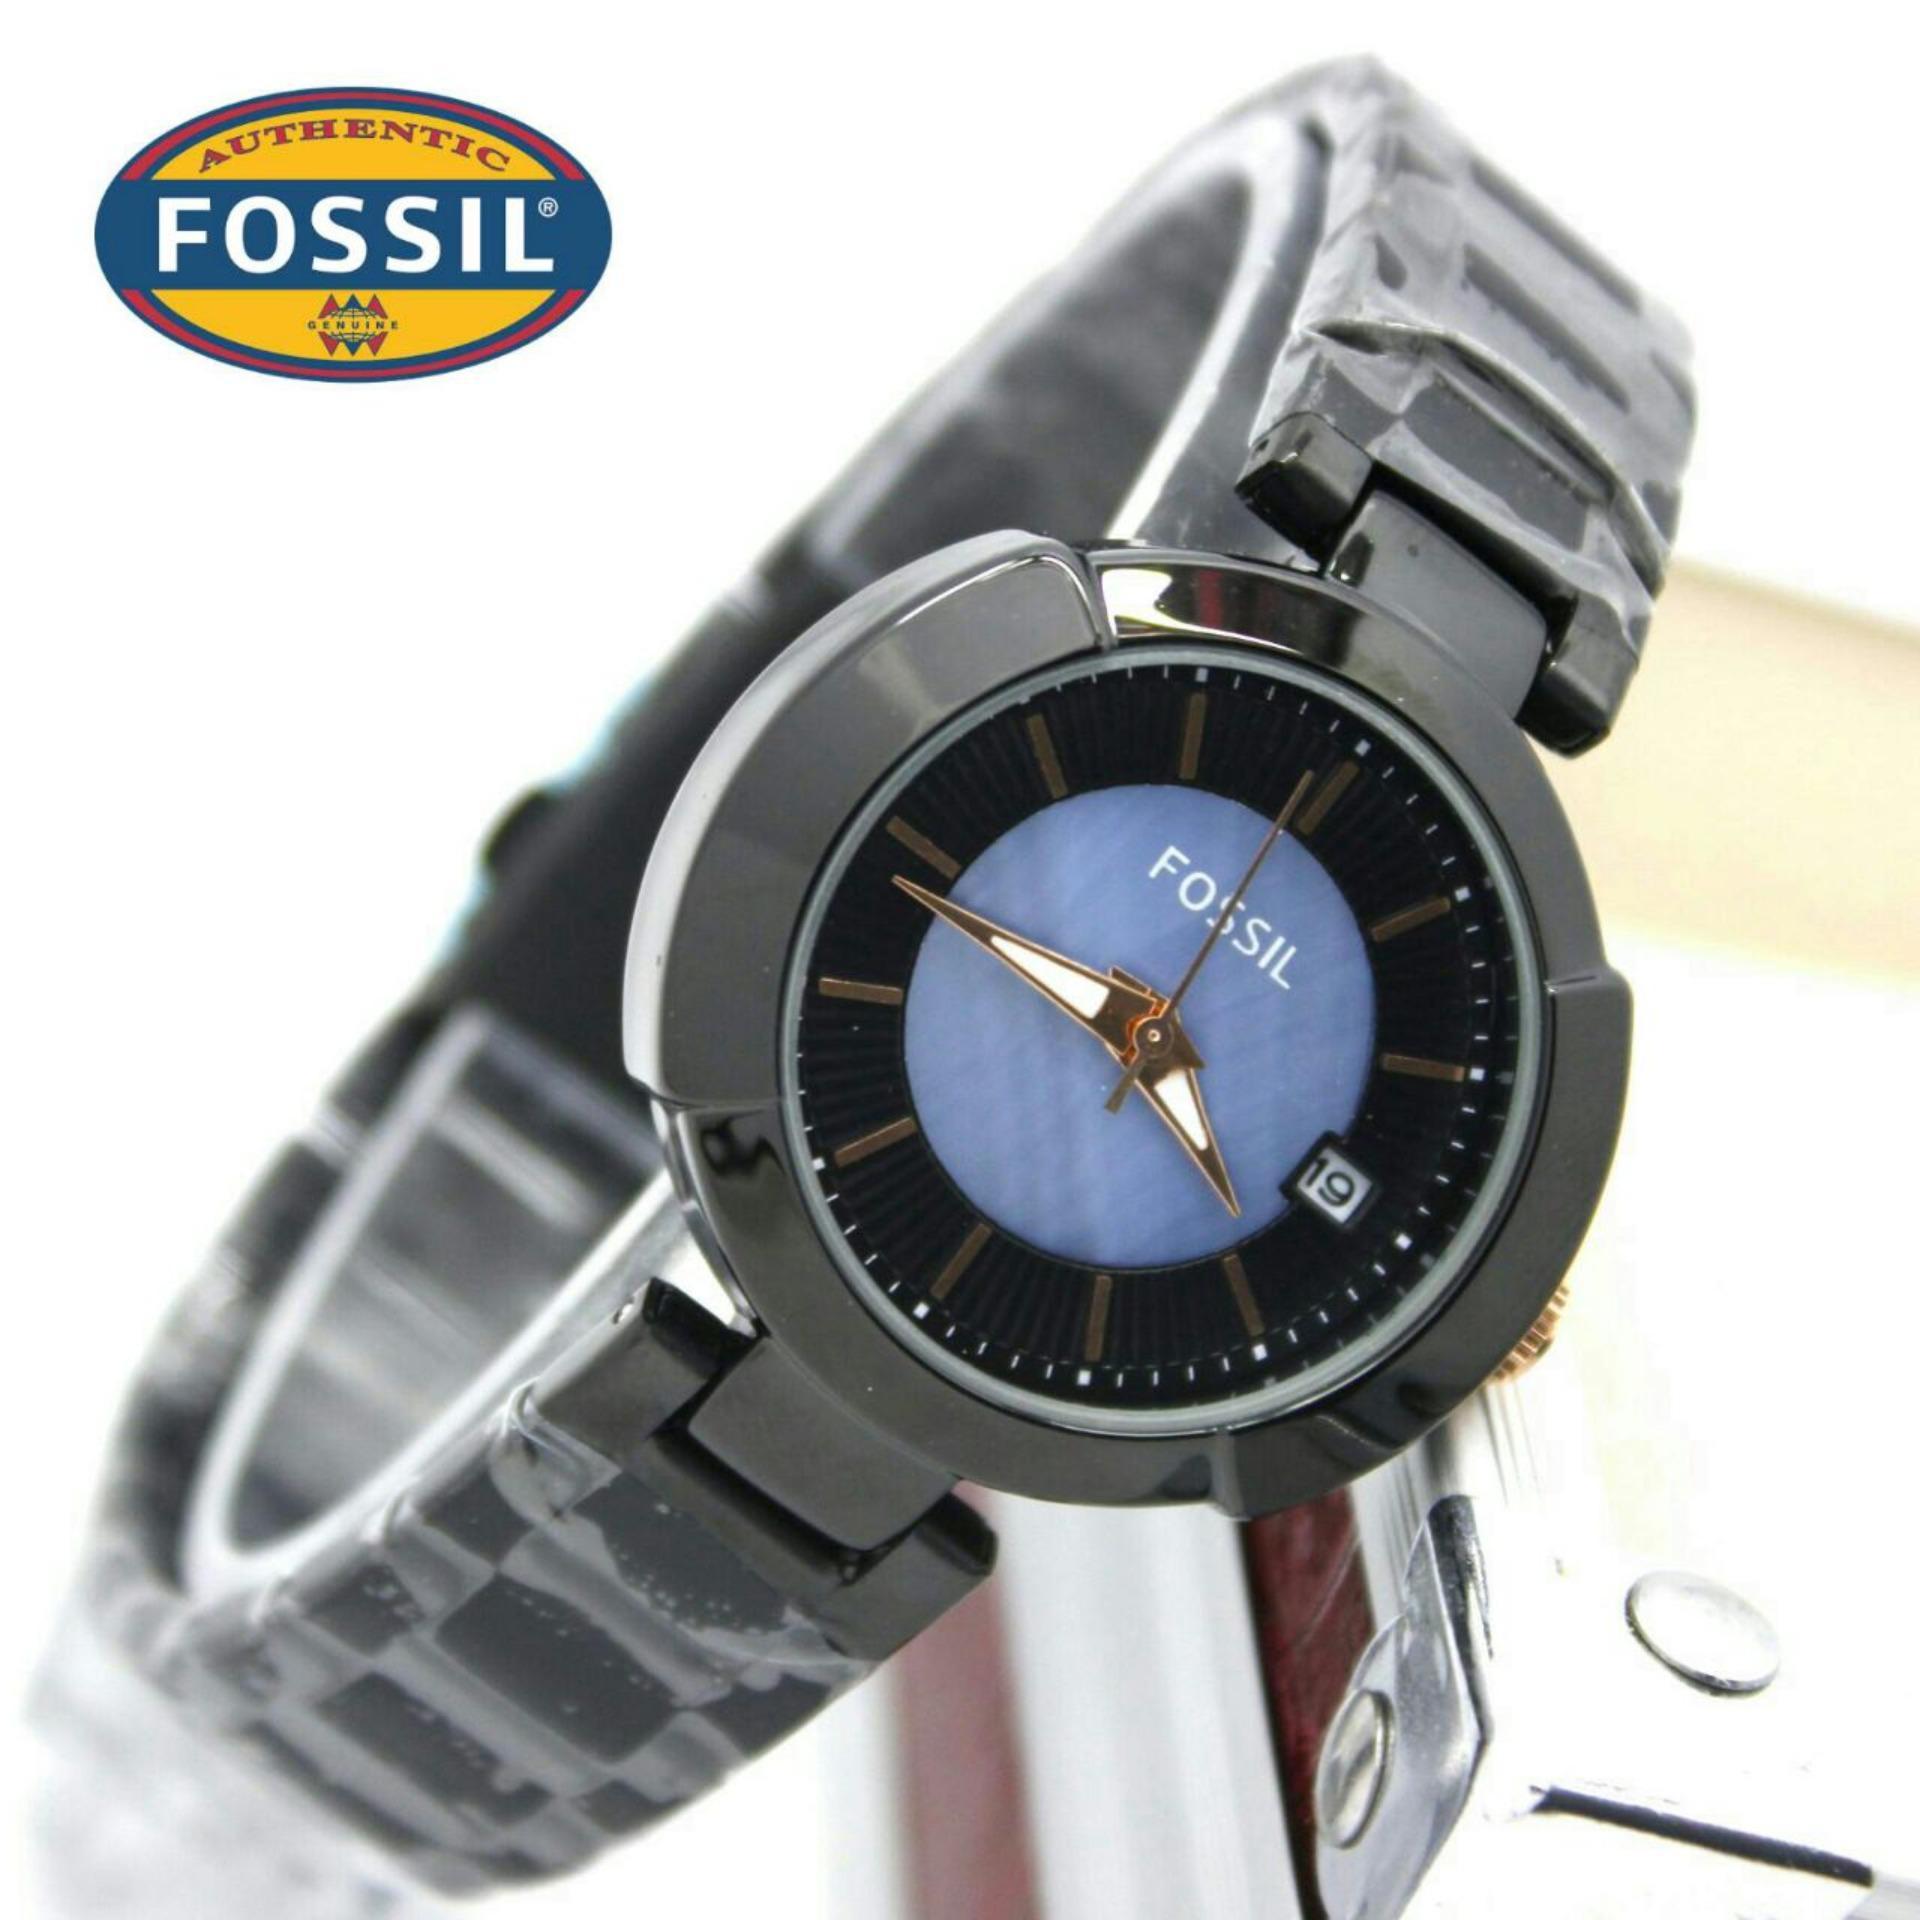 Jam tangan FOSIL wanita TERBARU masakini